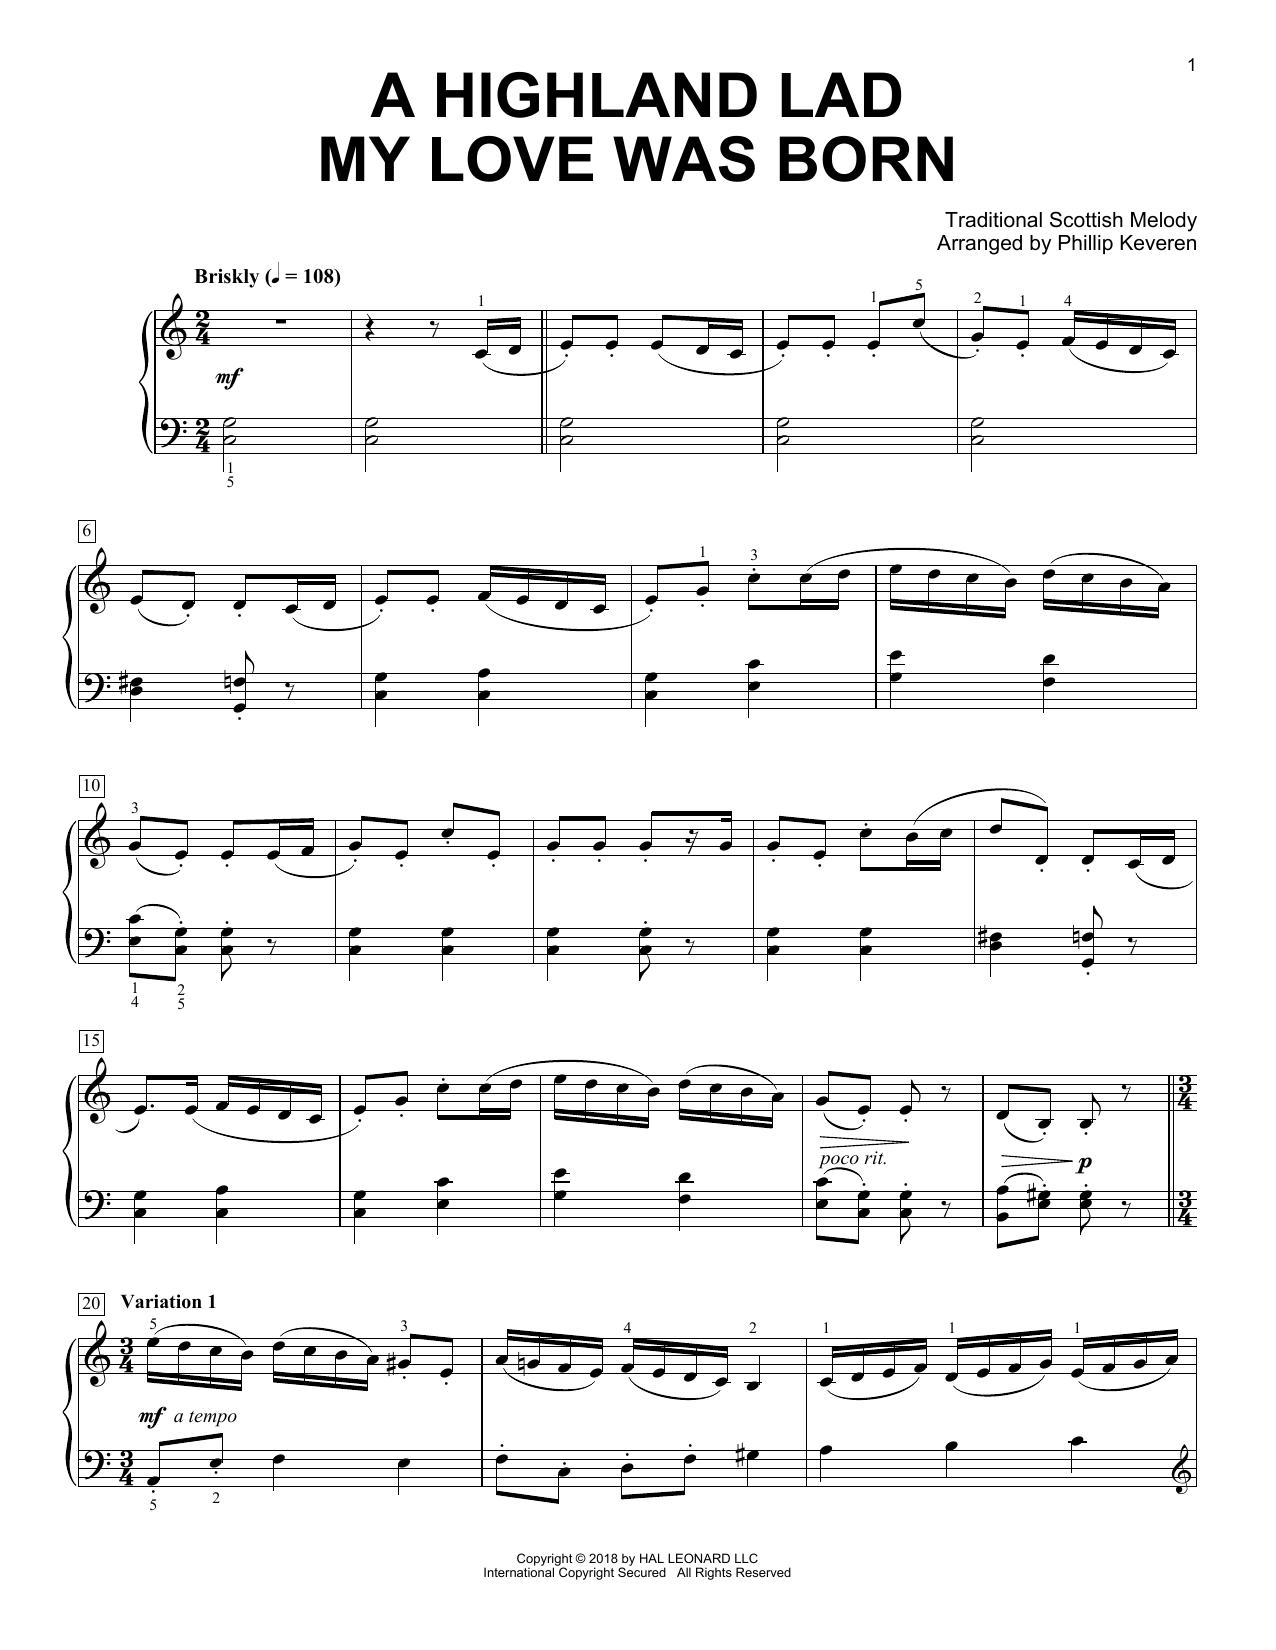 A Highland Lad My Love Was Born [Classical version] (arr. Phillip Keveren) (Piano Solo)